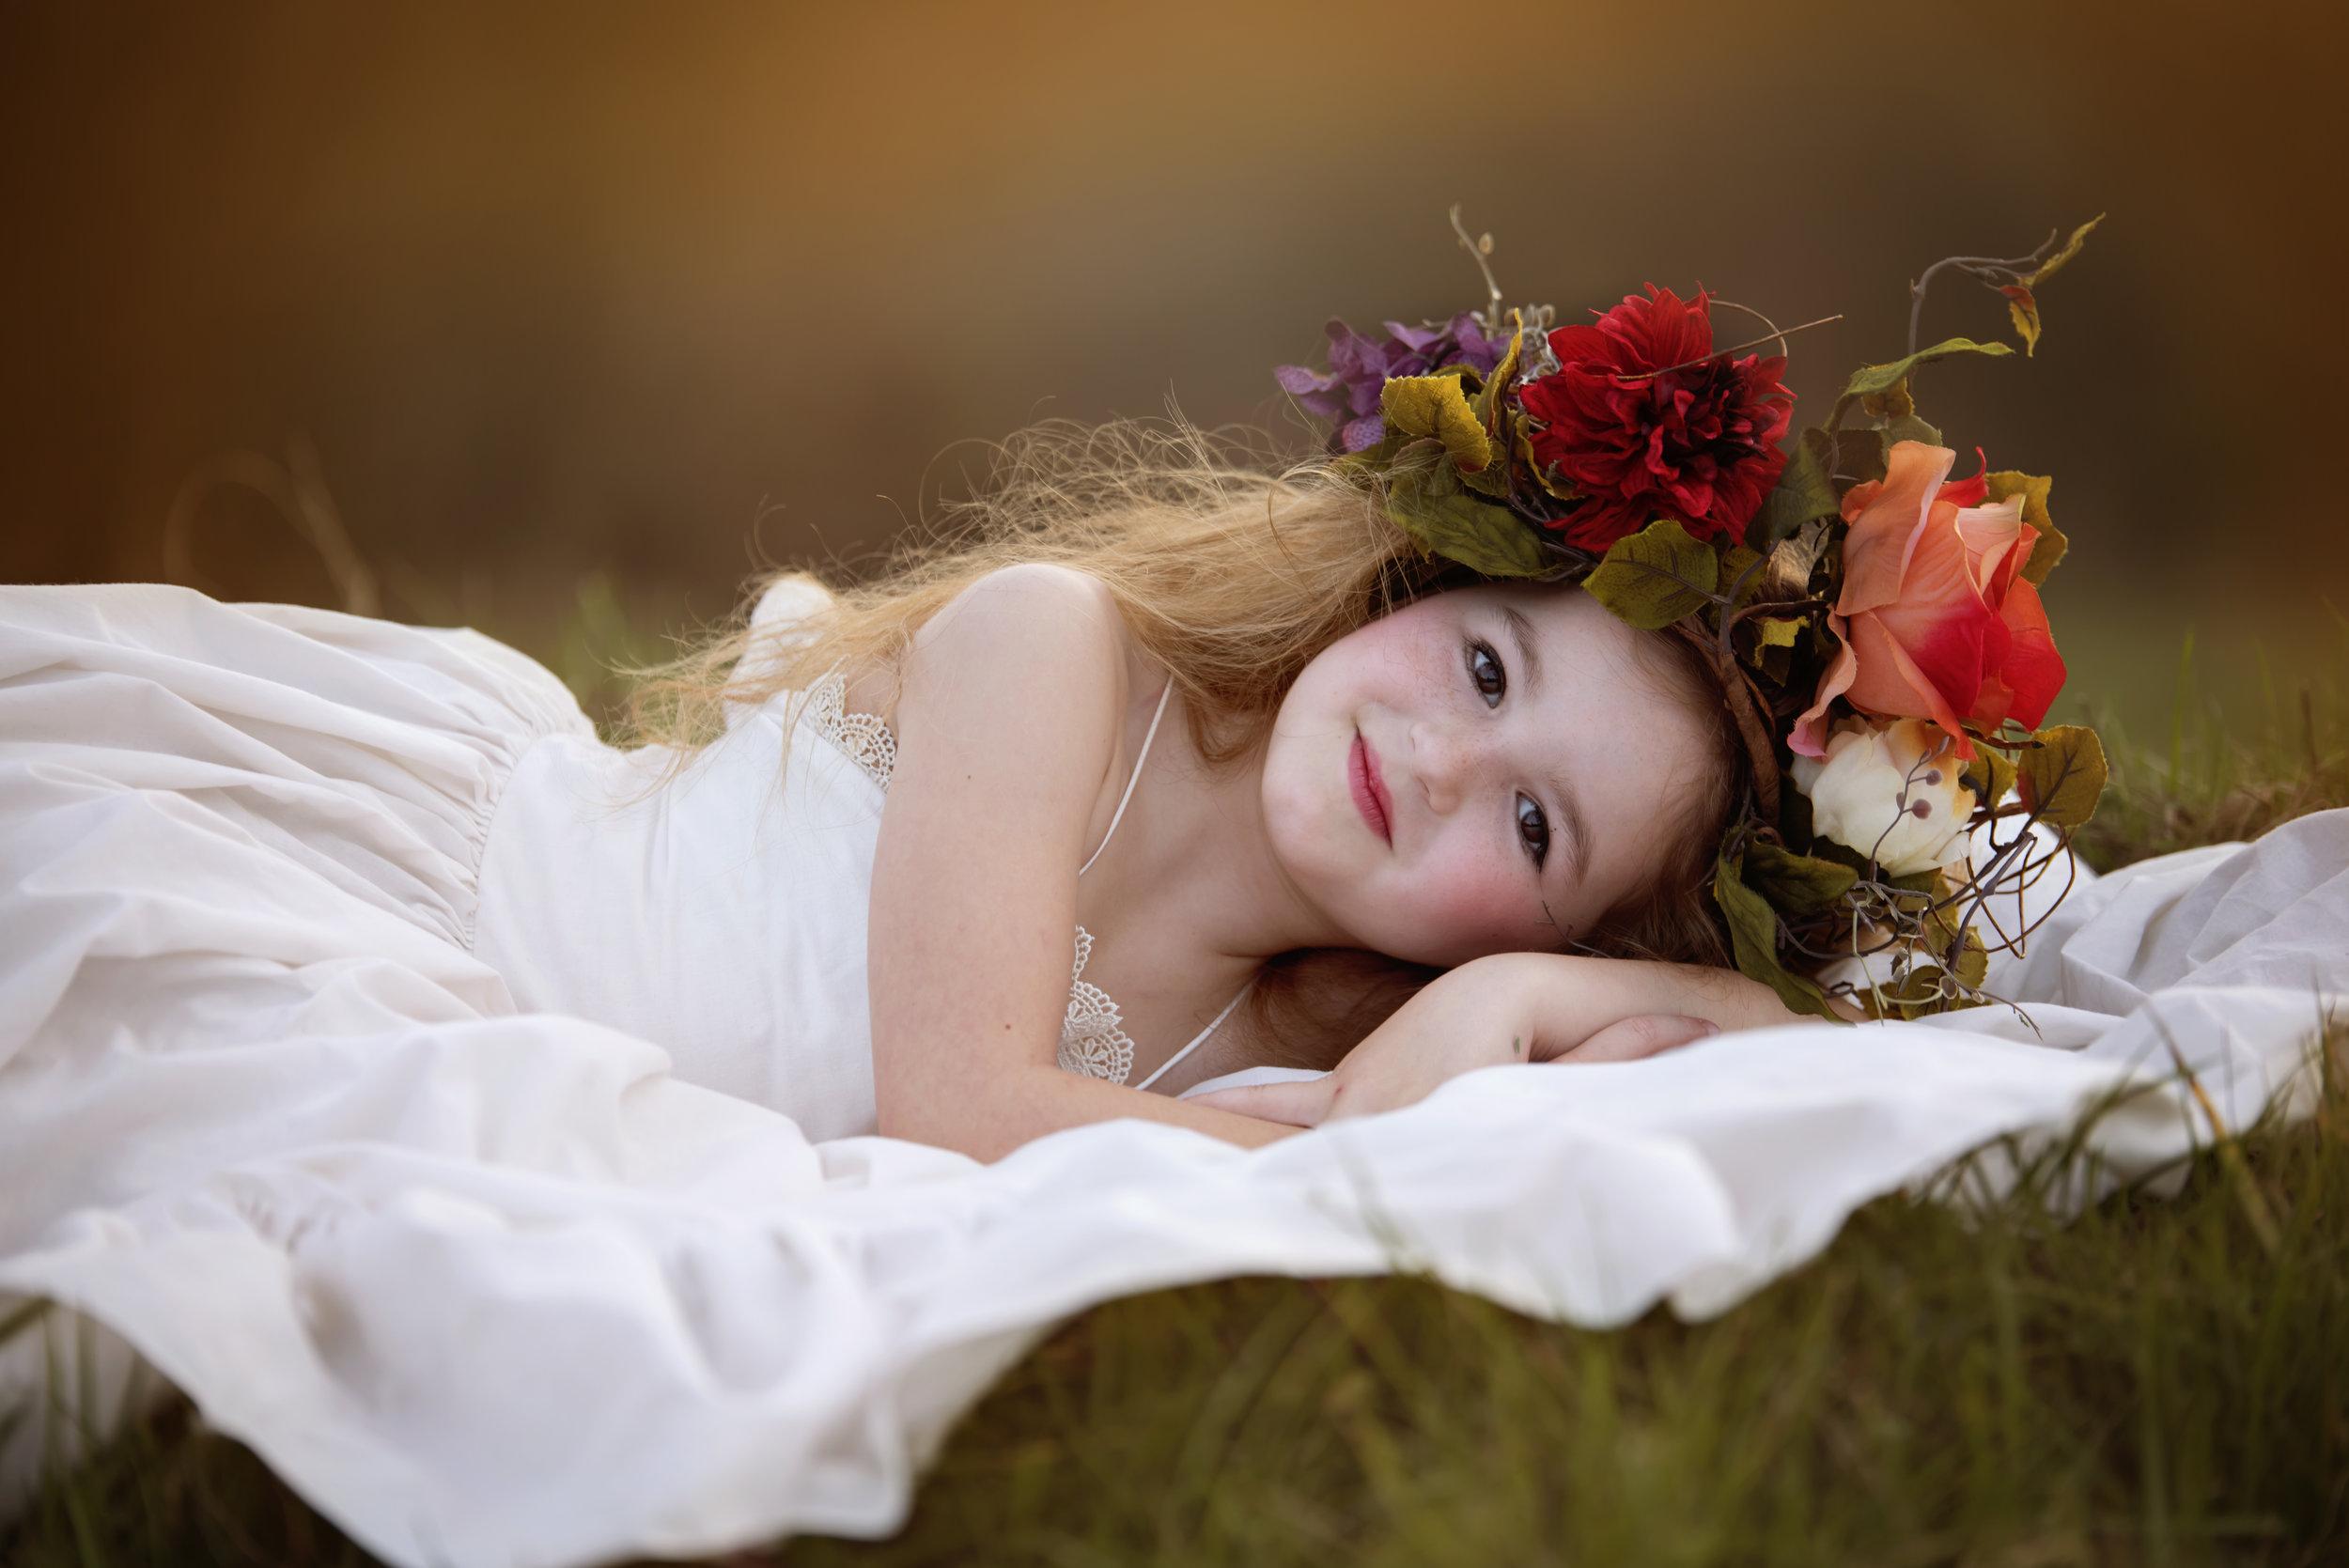 Reina-LeGrand-Photography-Photographer-Family-DFW-Dallas-Fort-Worth-Maren-Southlake-Colleyville-Grapevine-Roanoke-Keller-Westlake-Portrait-Portraiture-Photo-Session-julia-Children-Child-baby.jpg